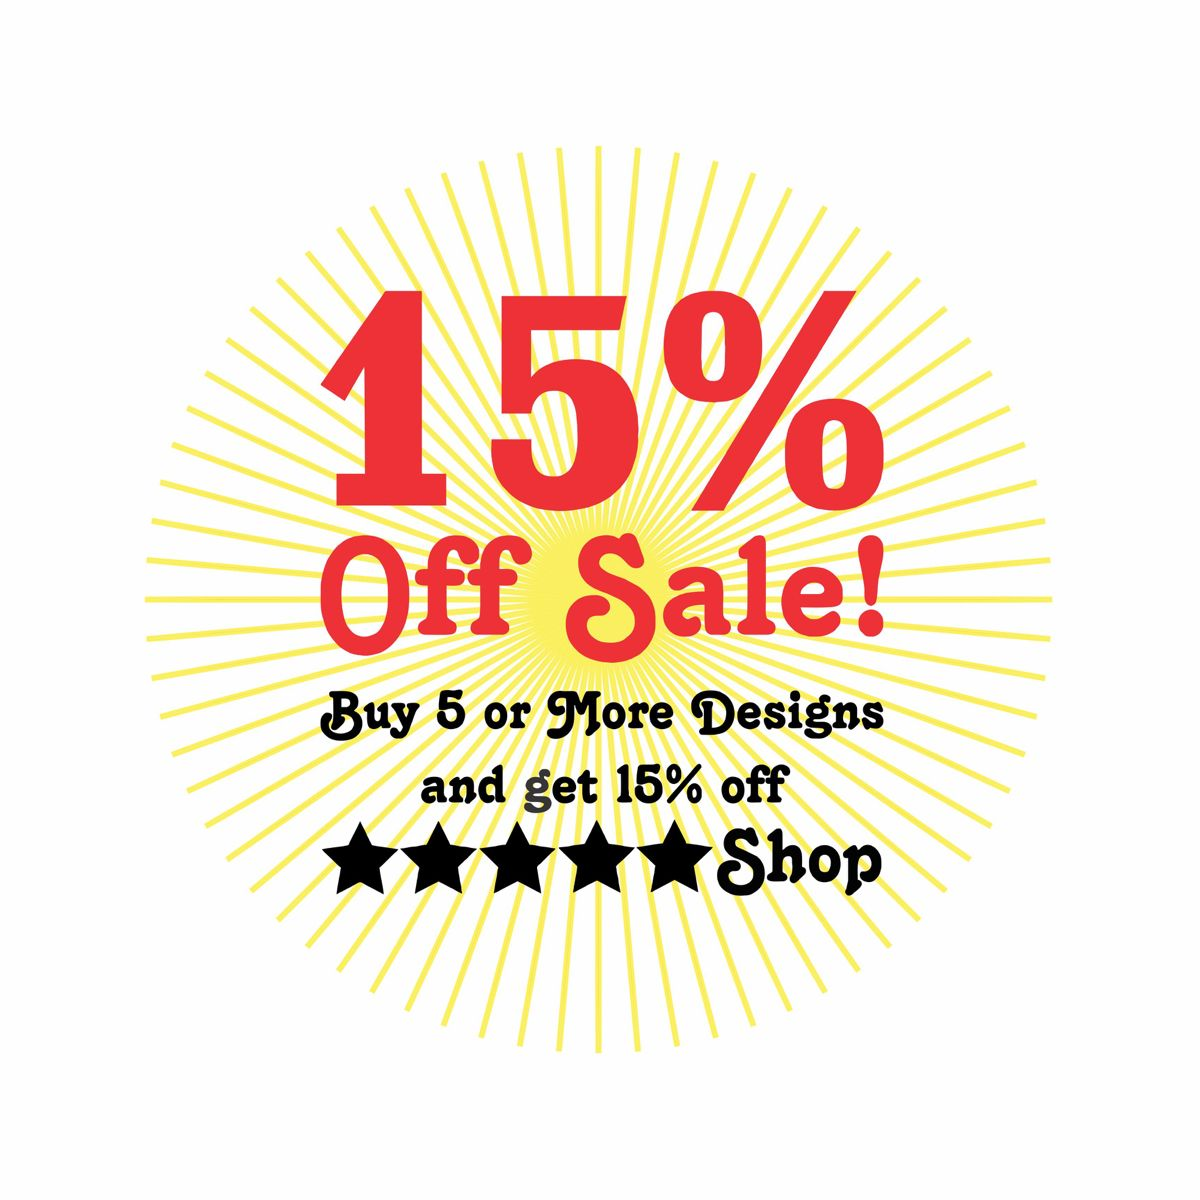 Png Svg Digital Clipart Images For Instant Download Artperch Etsy Tshirt Shop Design Etsy Sales